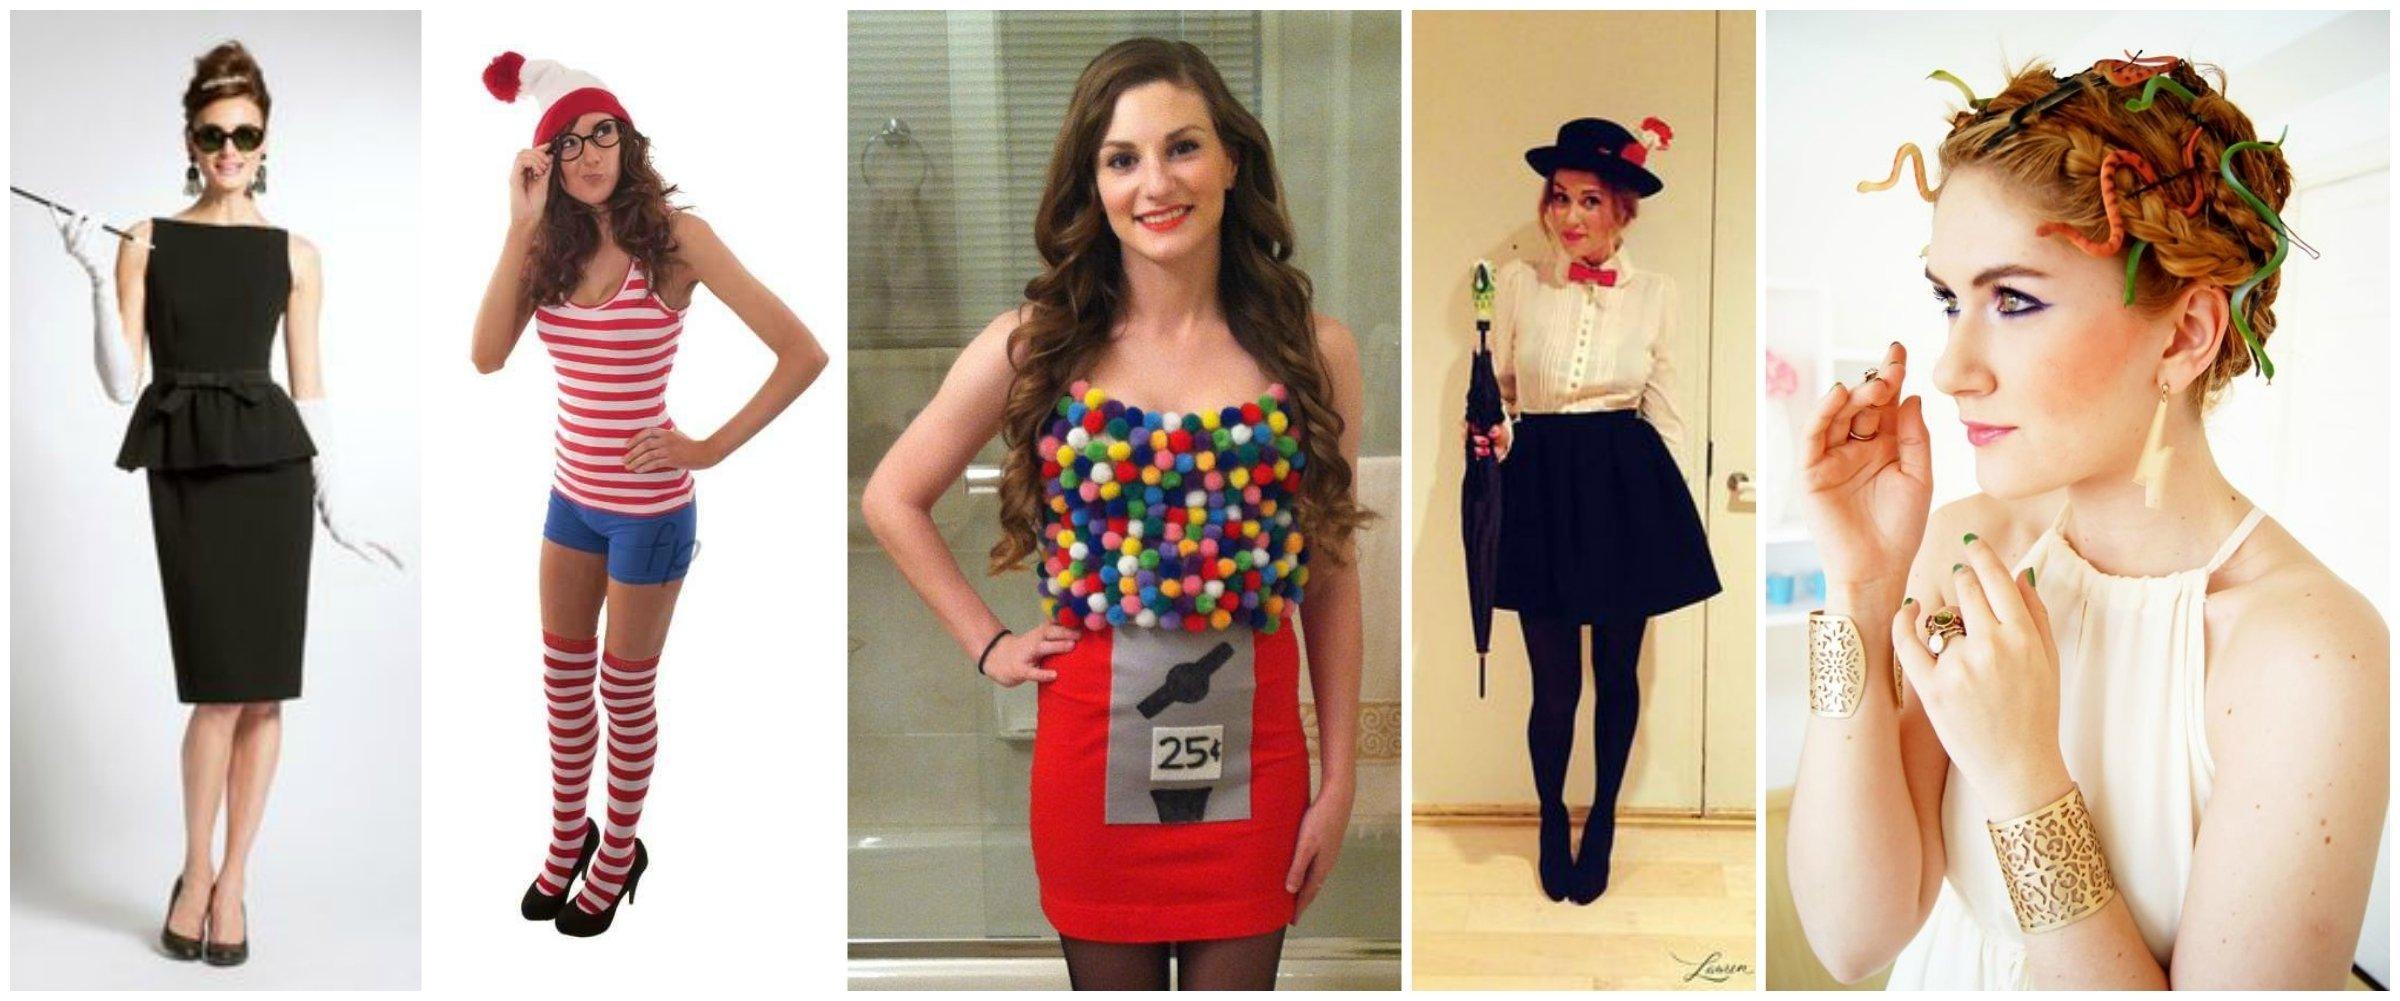 10 Awesome Homemade Halloween Costume Ideas For Women image gallery homemade halloween costumes girls diy halloween 12 2020